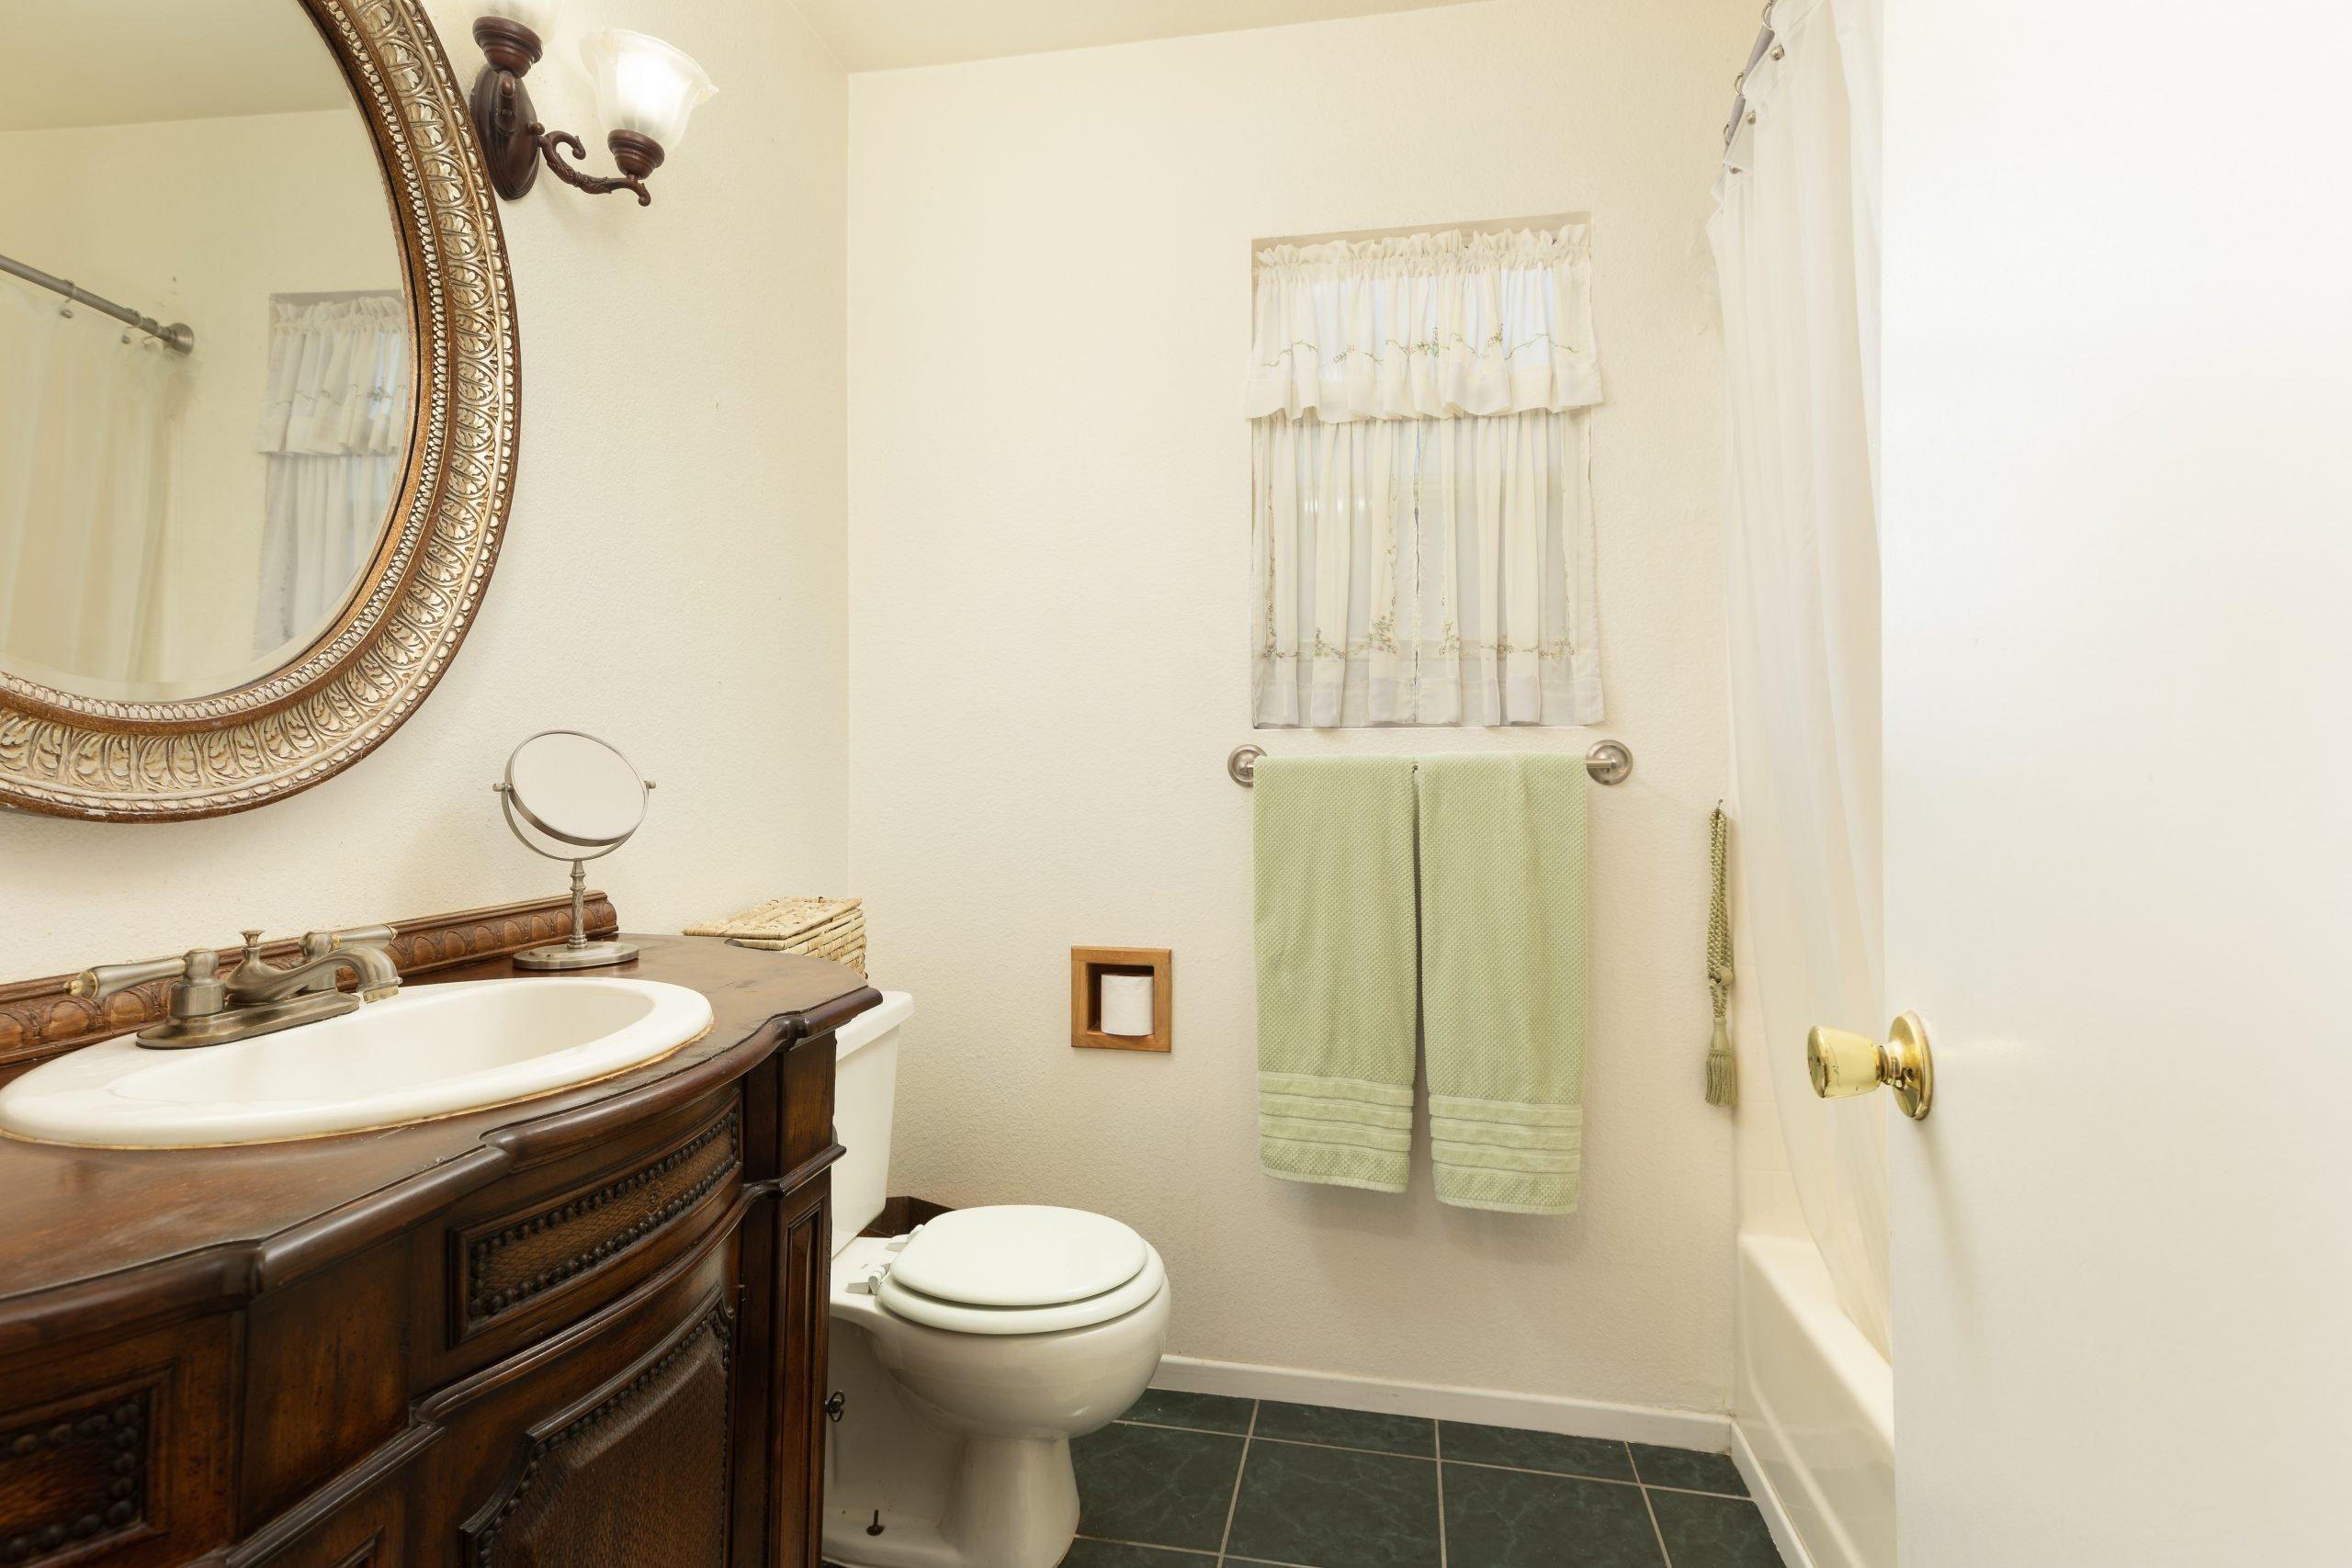 Palmdale CA Real Estate 37128 Marye Margo Circle Palmdale Bathroom One